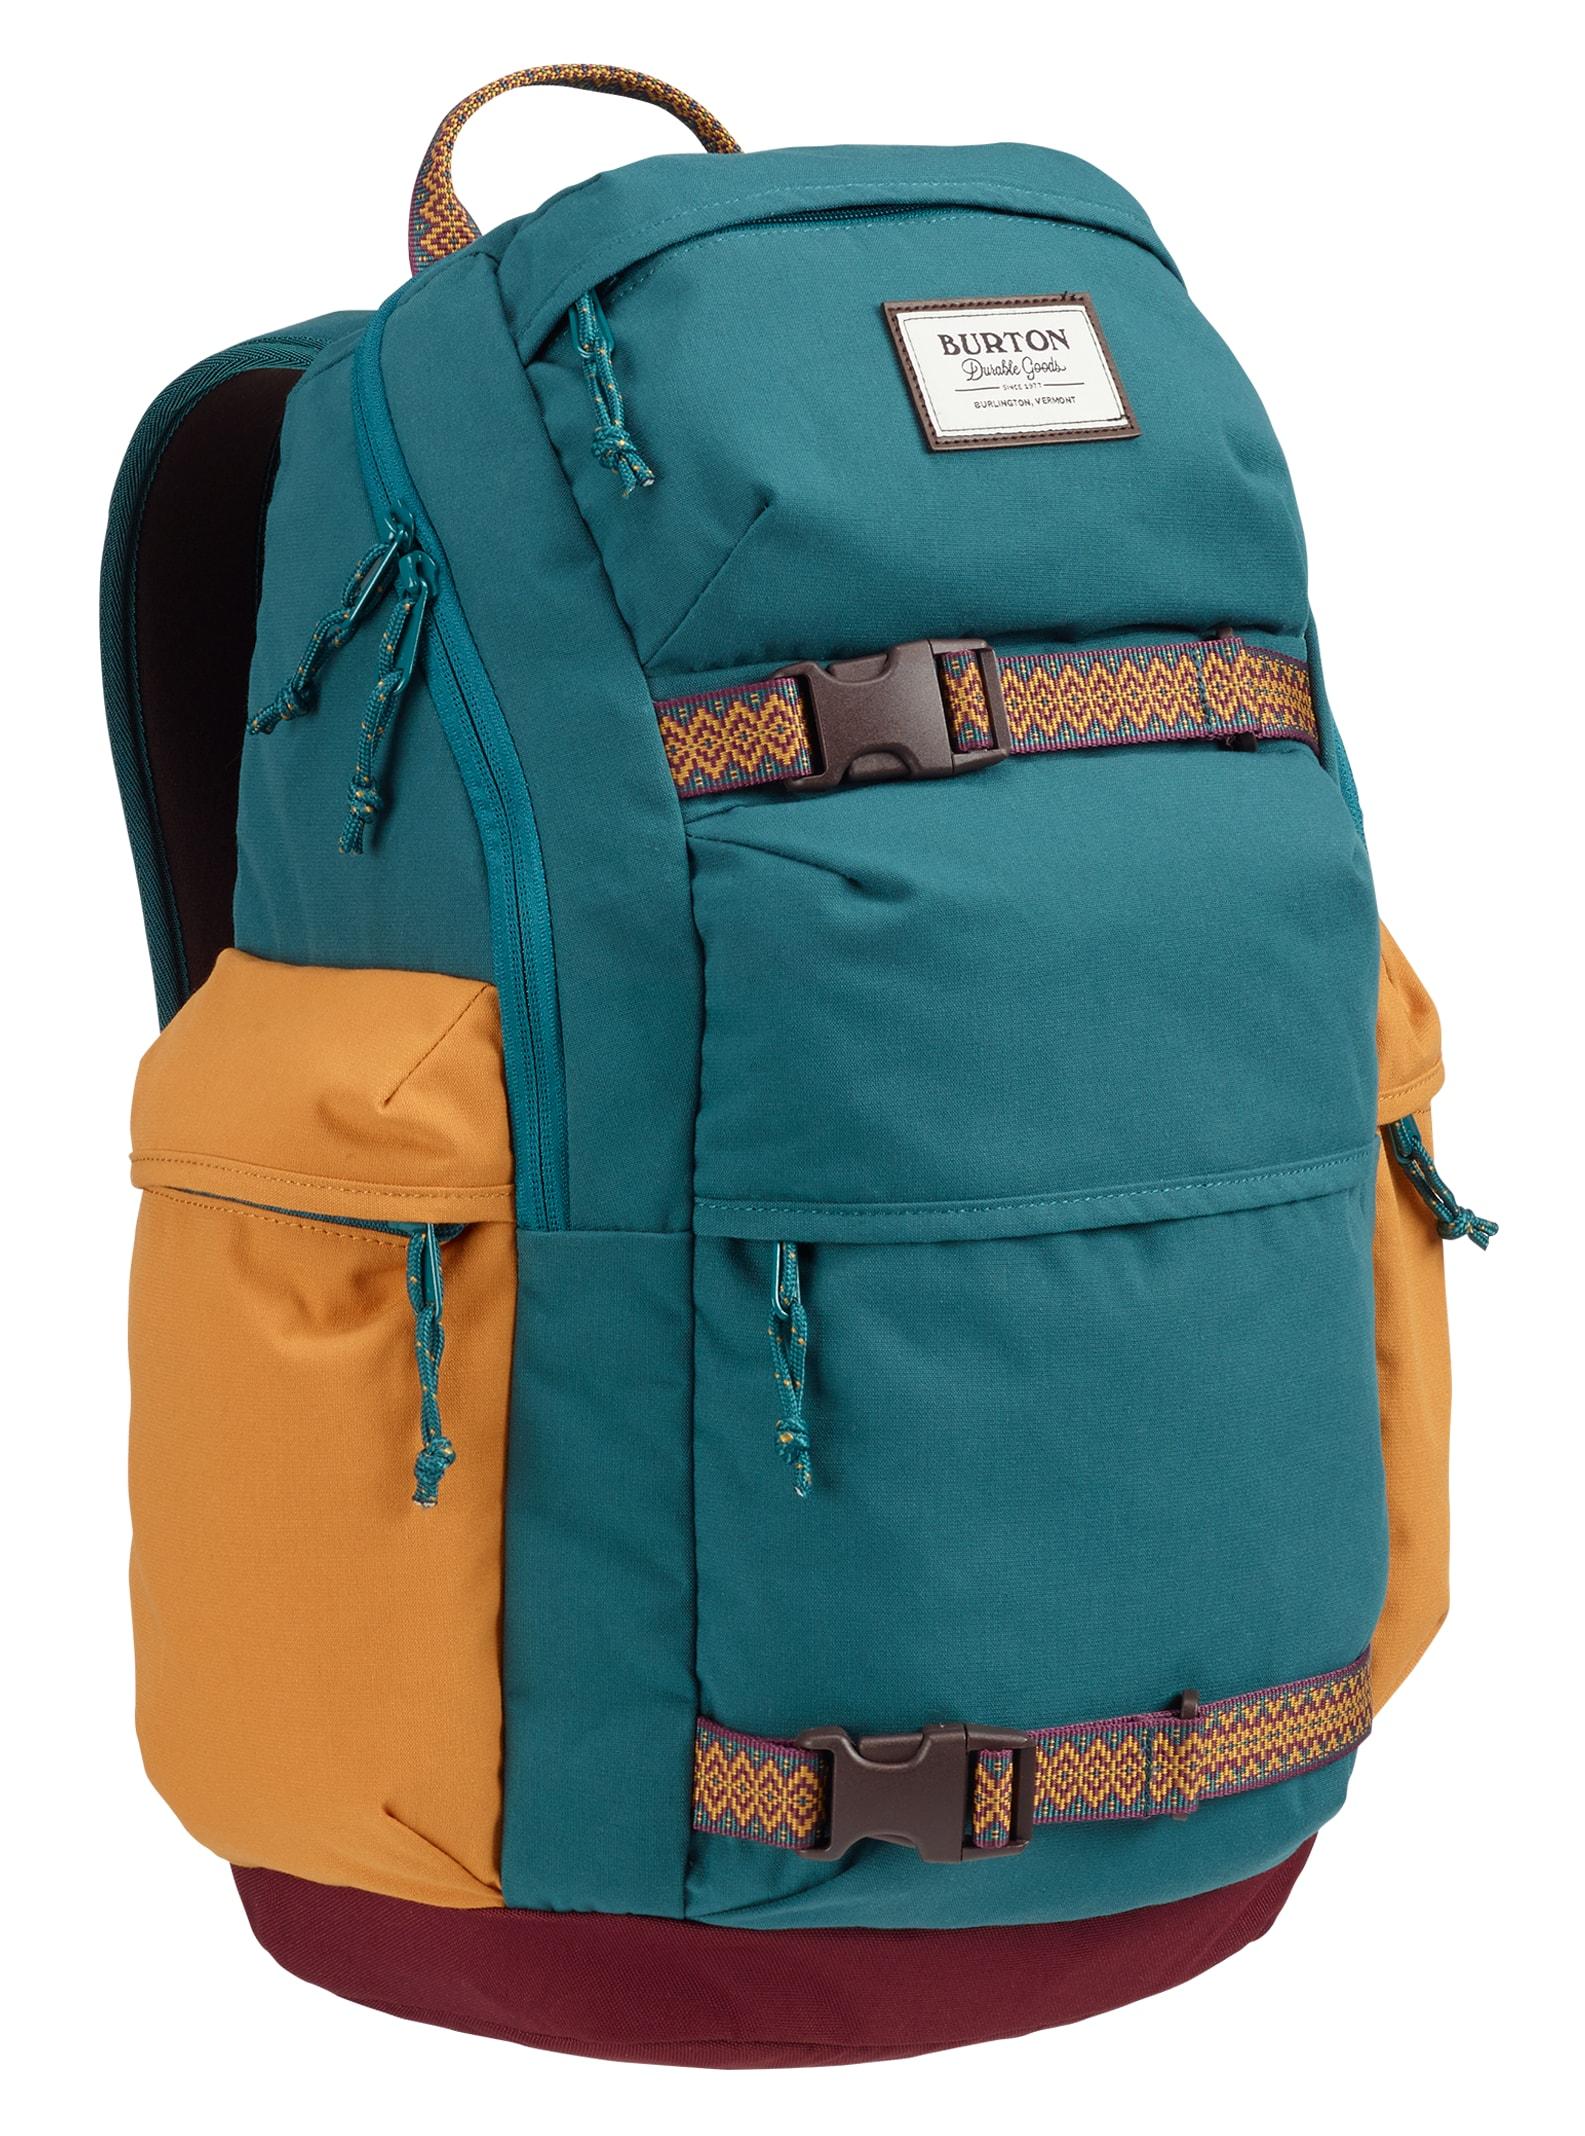 c441f1820c8 Backpacks   Burton Snowboards